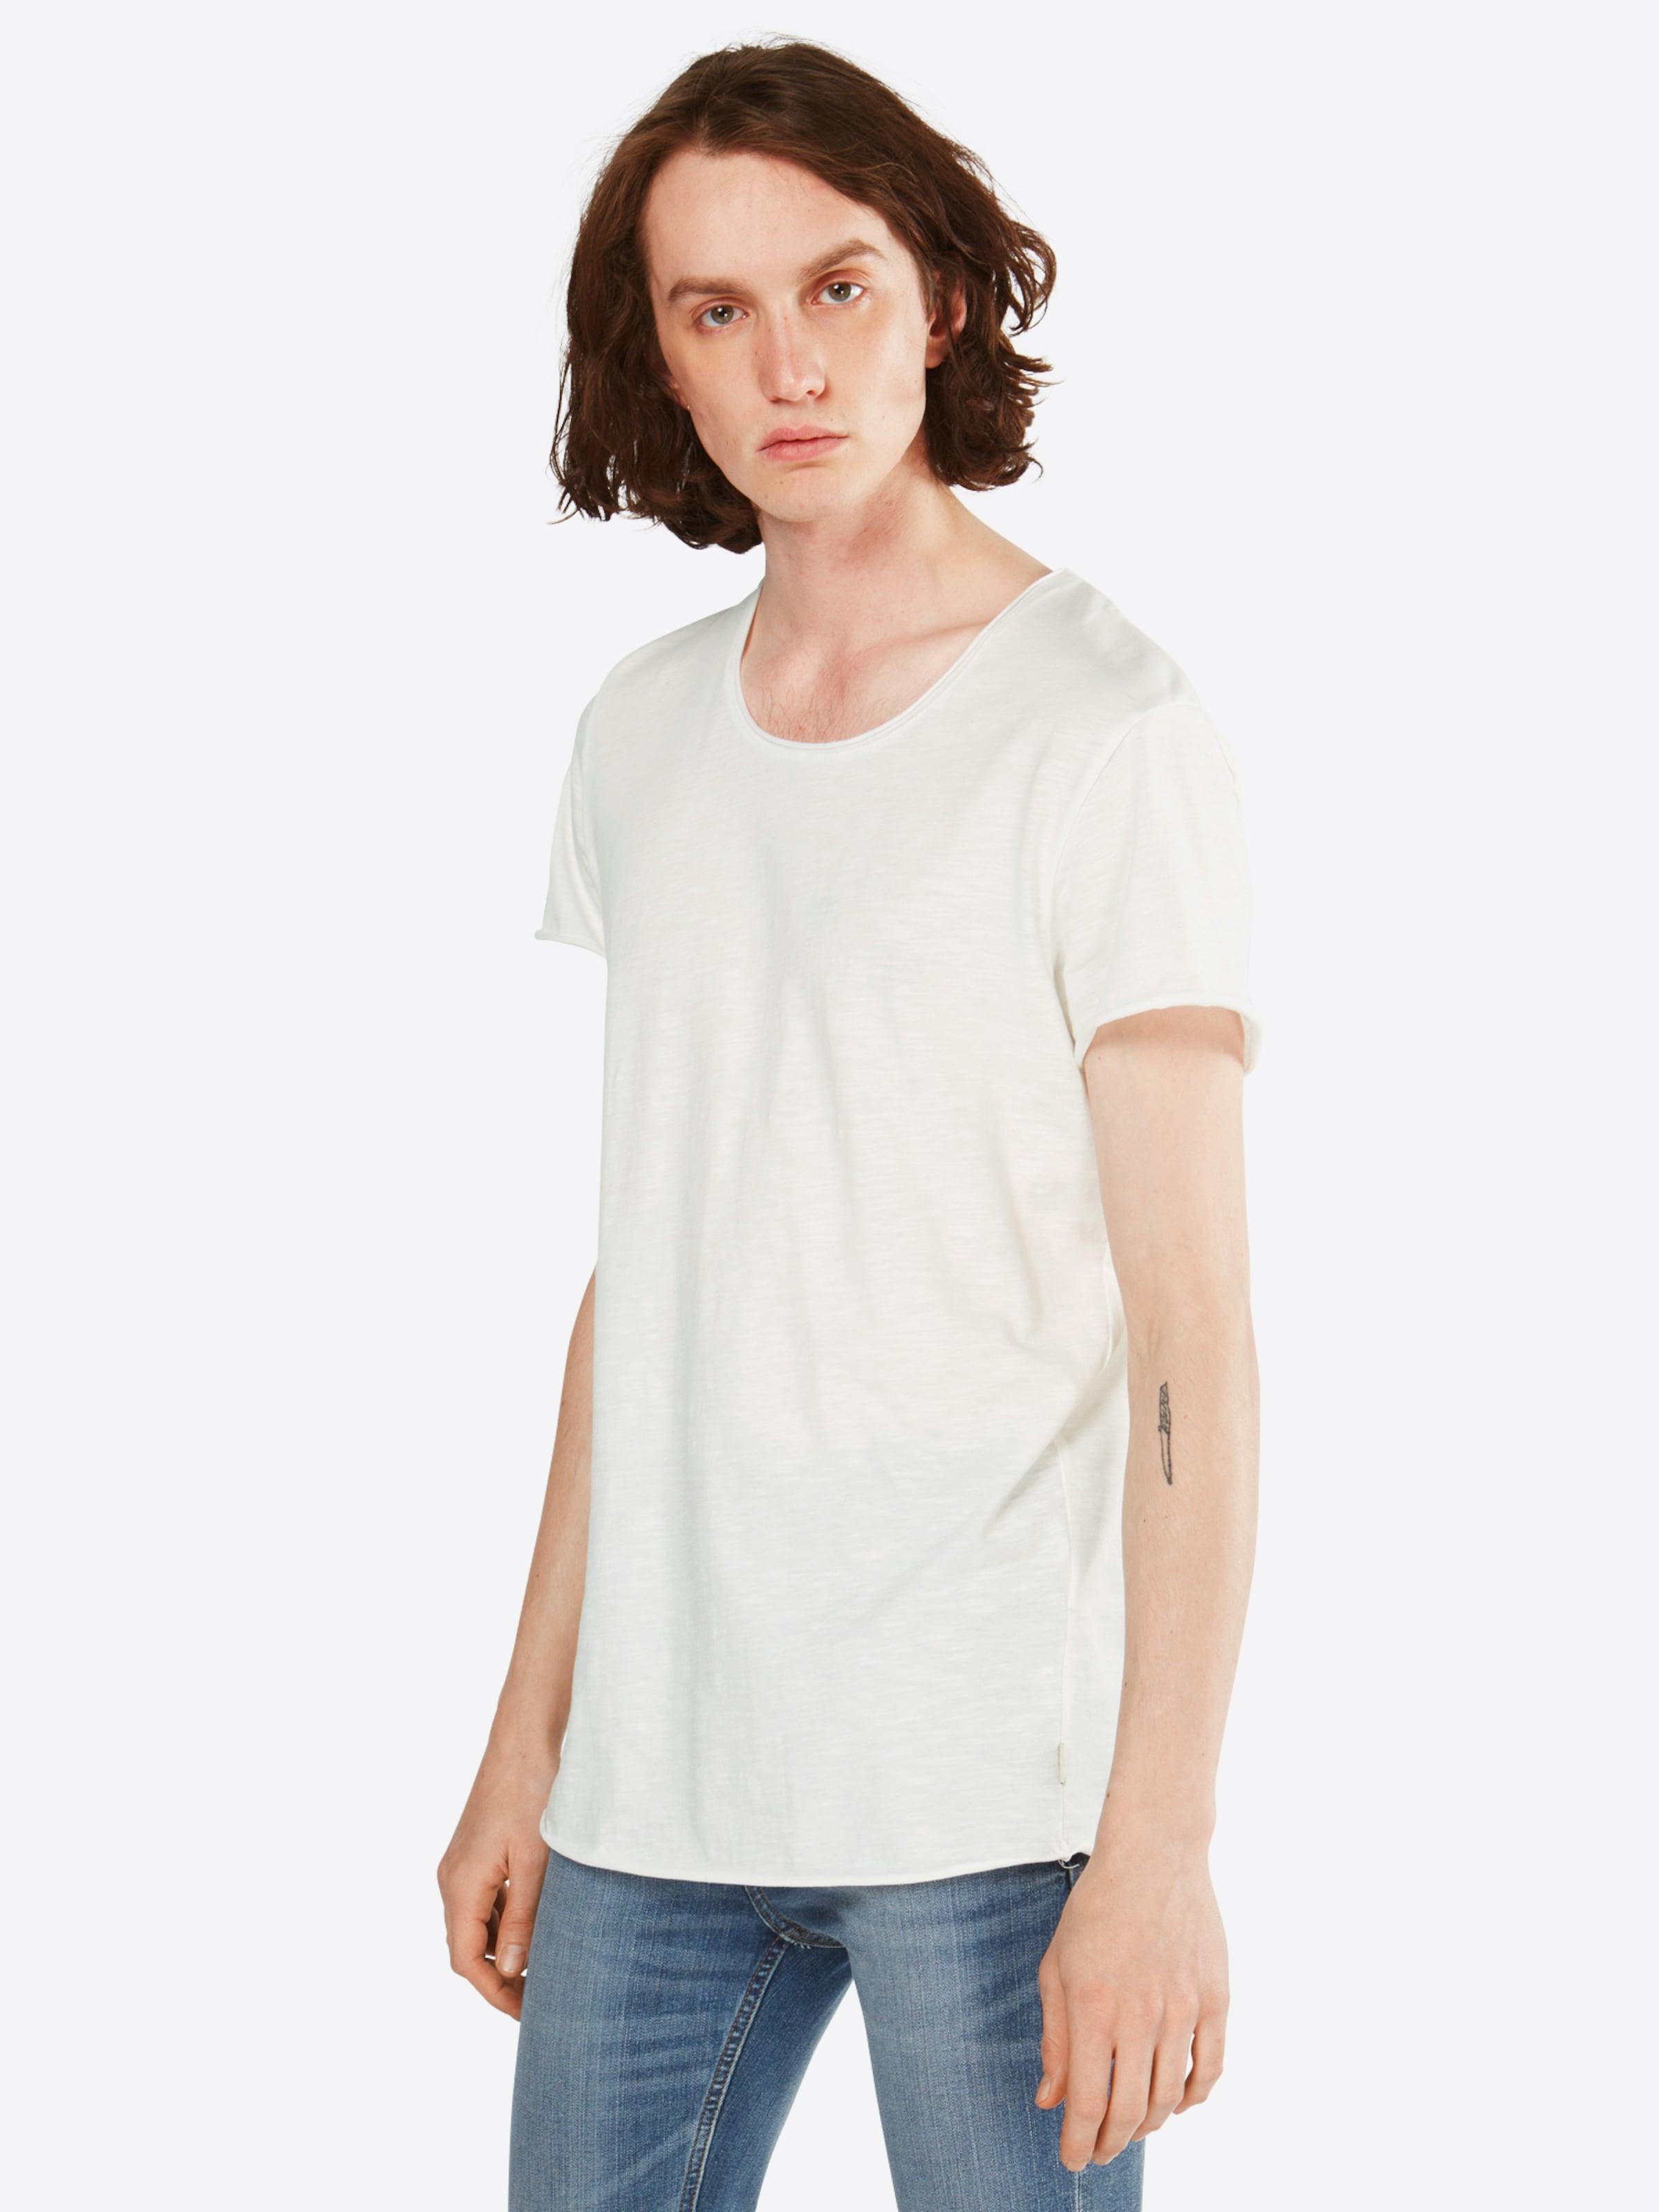 In shirt neck Jackamp; Jones T Tee Ss U Weiß Noos' 'jjebas 0yvmONwn8